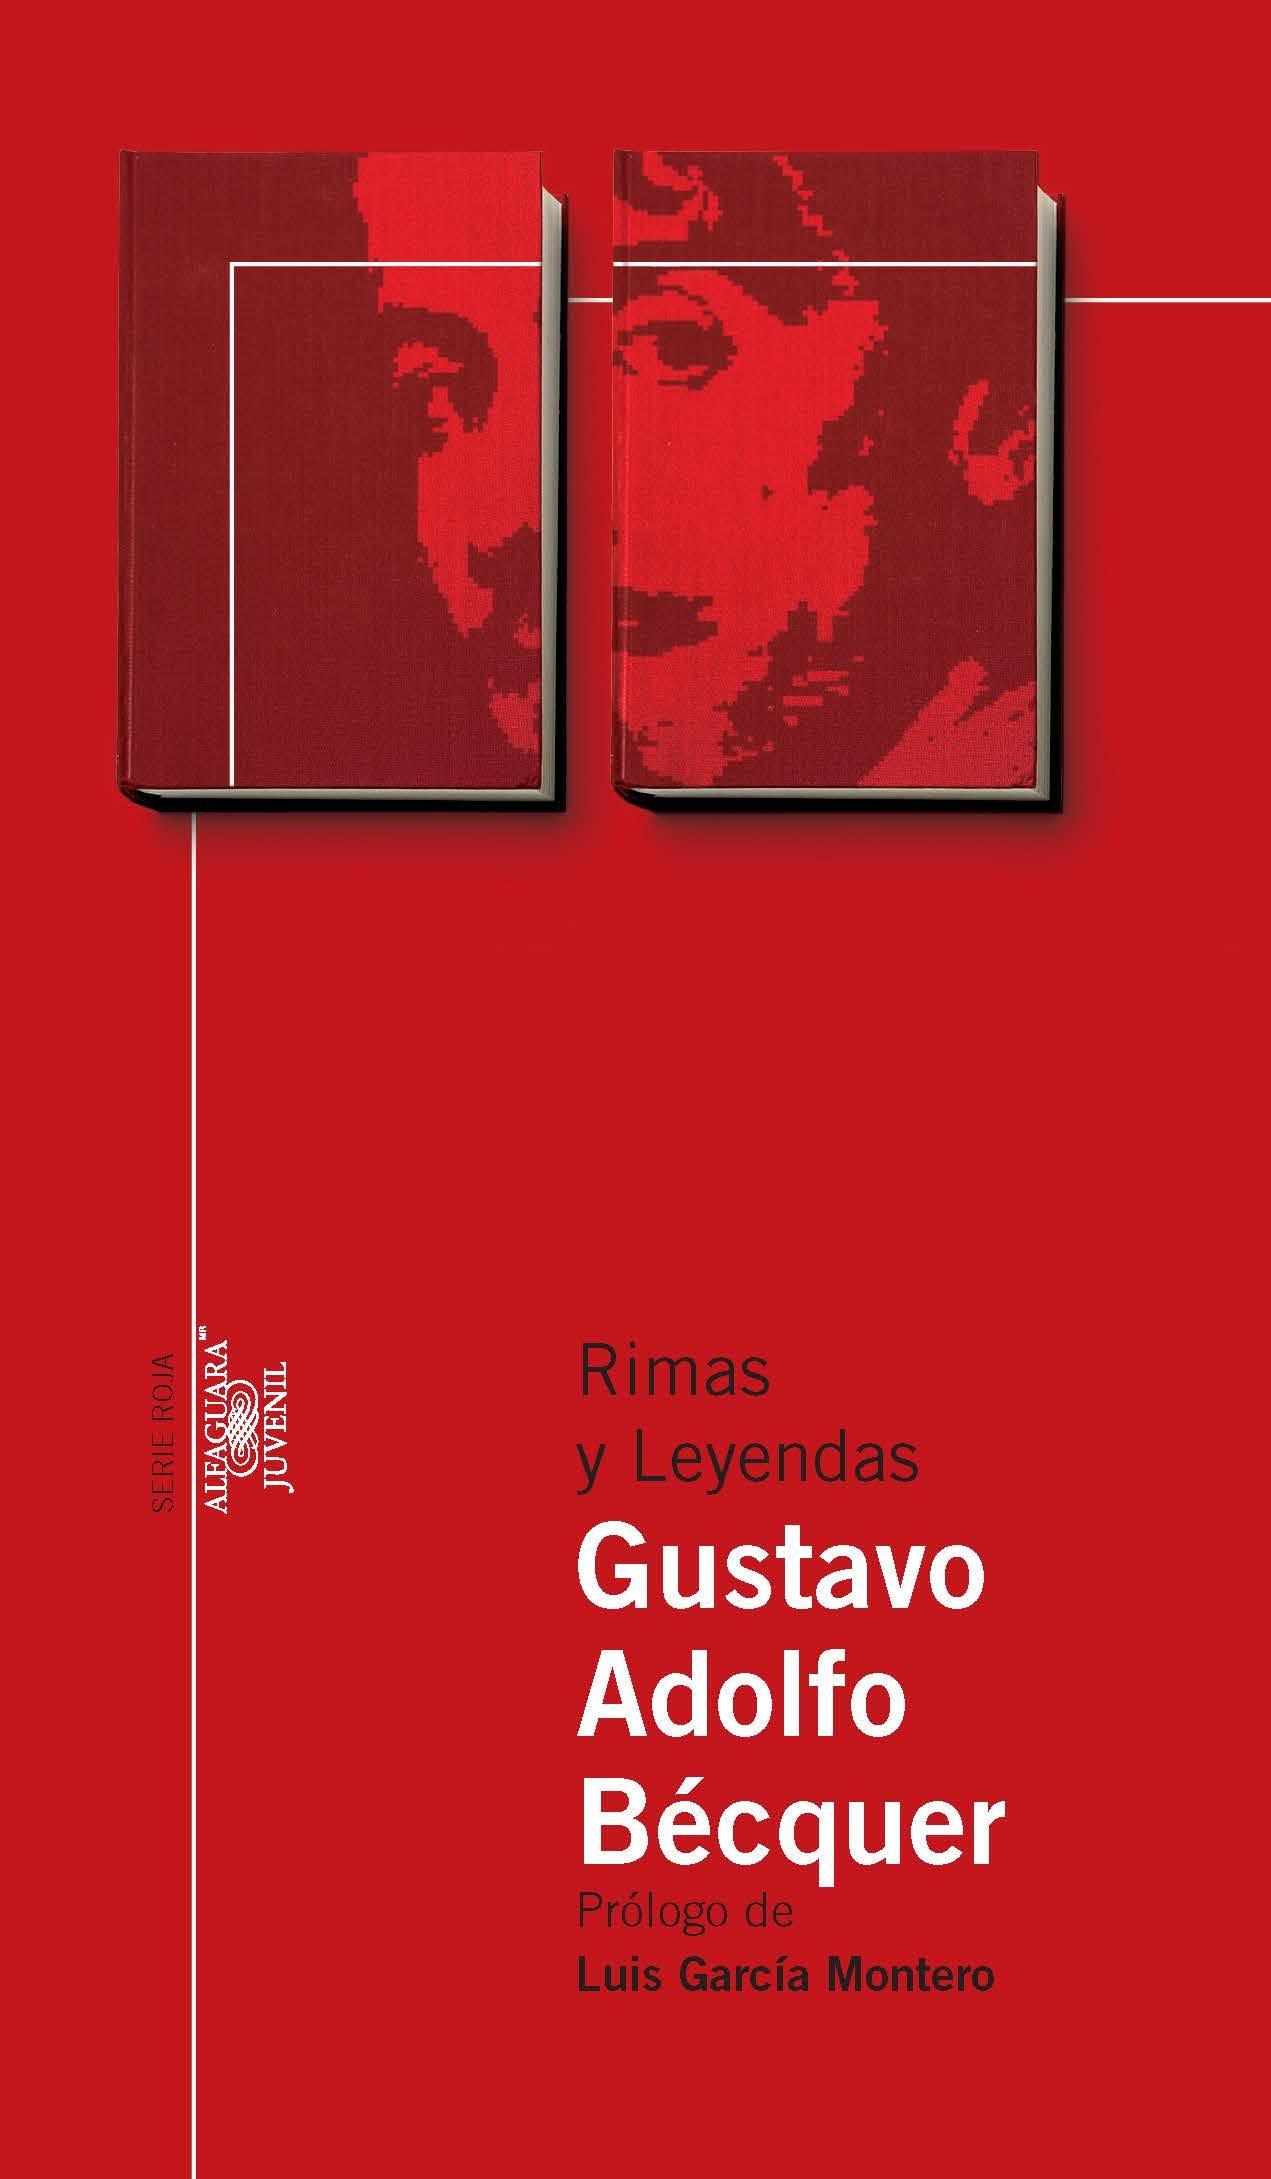 Amazon.com: Rimas y Leyendas (Serie Roja) (Spanish Edition) (9786070122187): Gustavo Adolfo Bécquer: Books